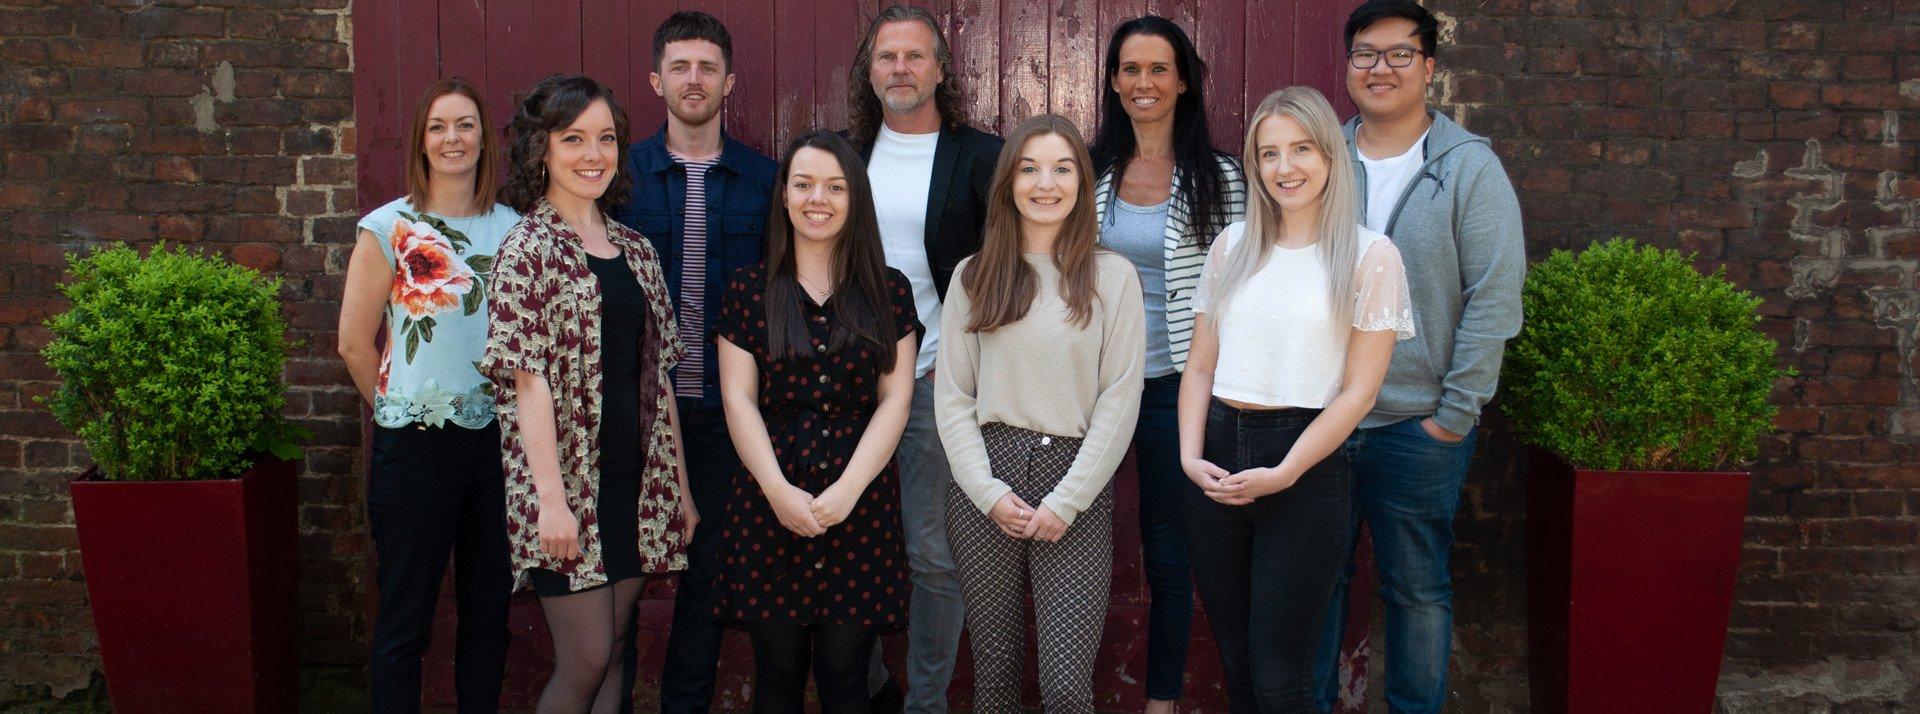 Bella Design and Marketing Team Photo